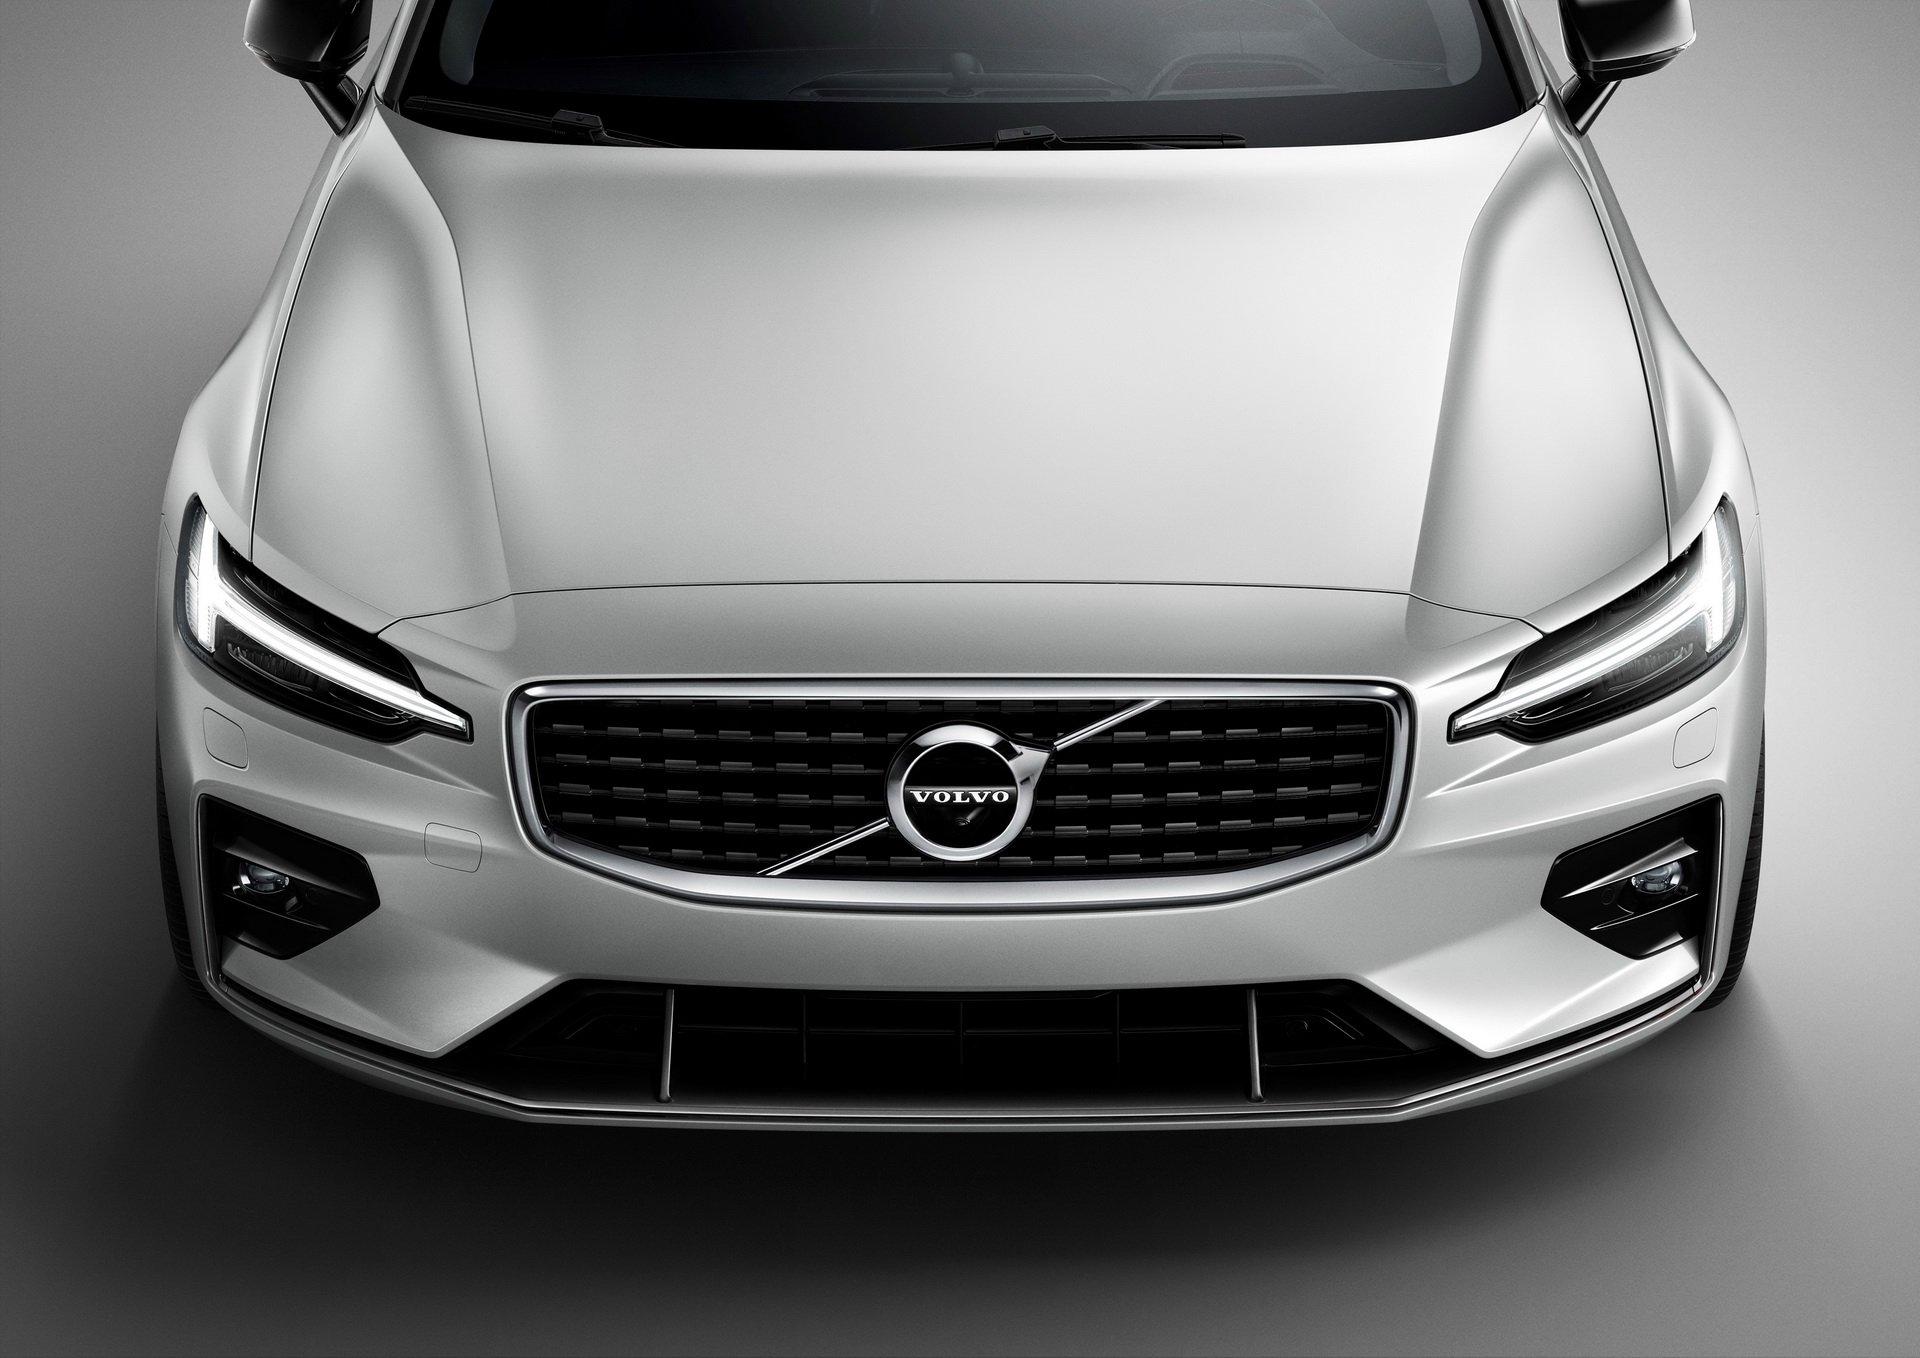 New Volvo V60 Gets Underwhelming R Design Body Kit